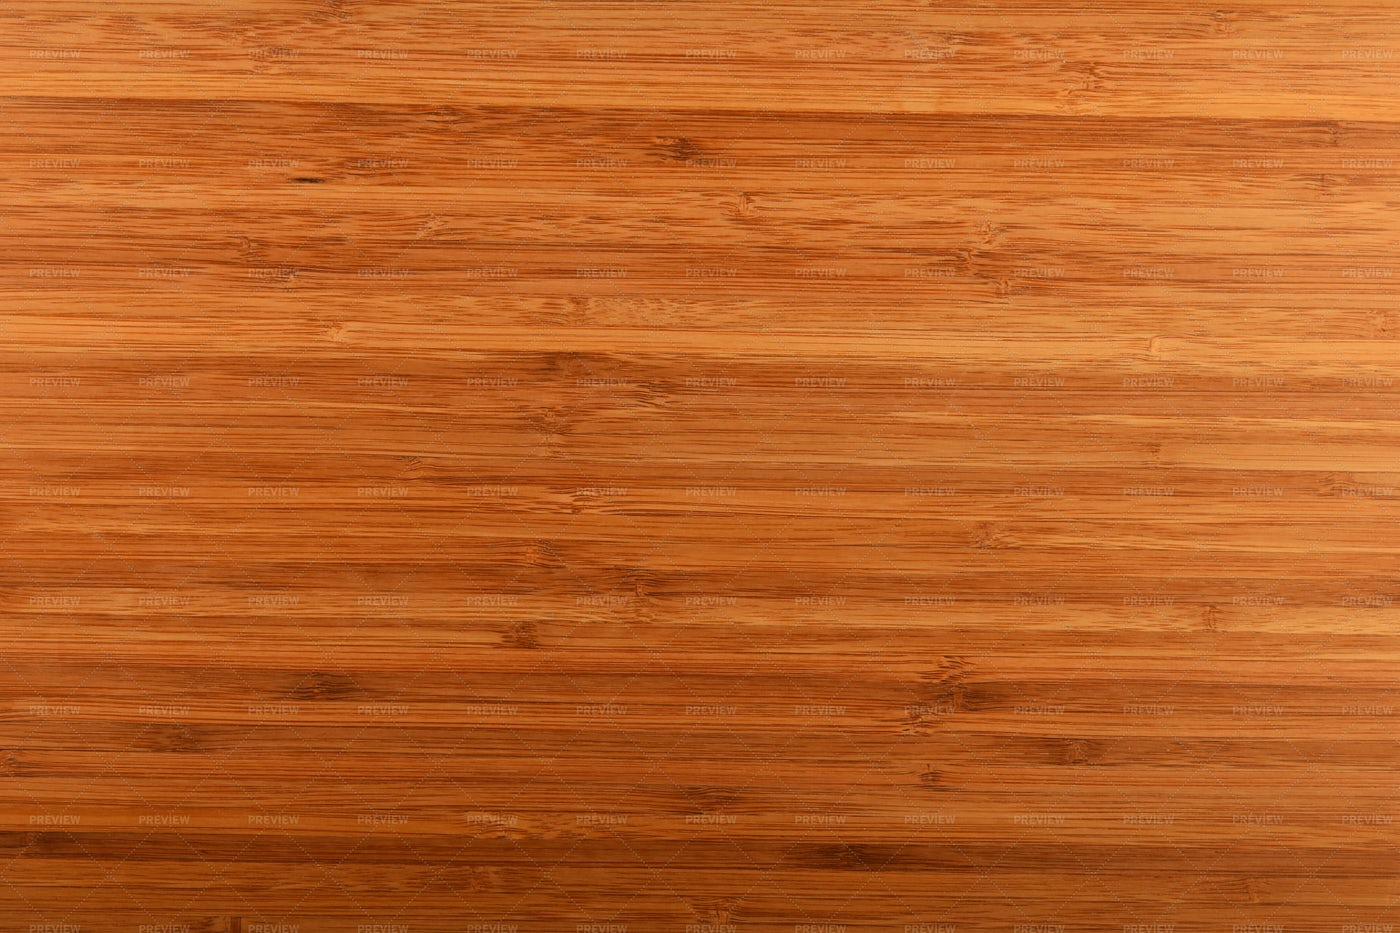 Chopping Board Close-Up: Stock Photos